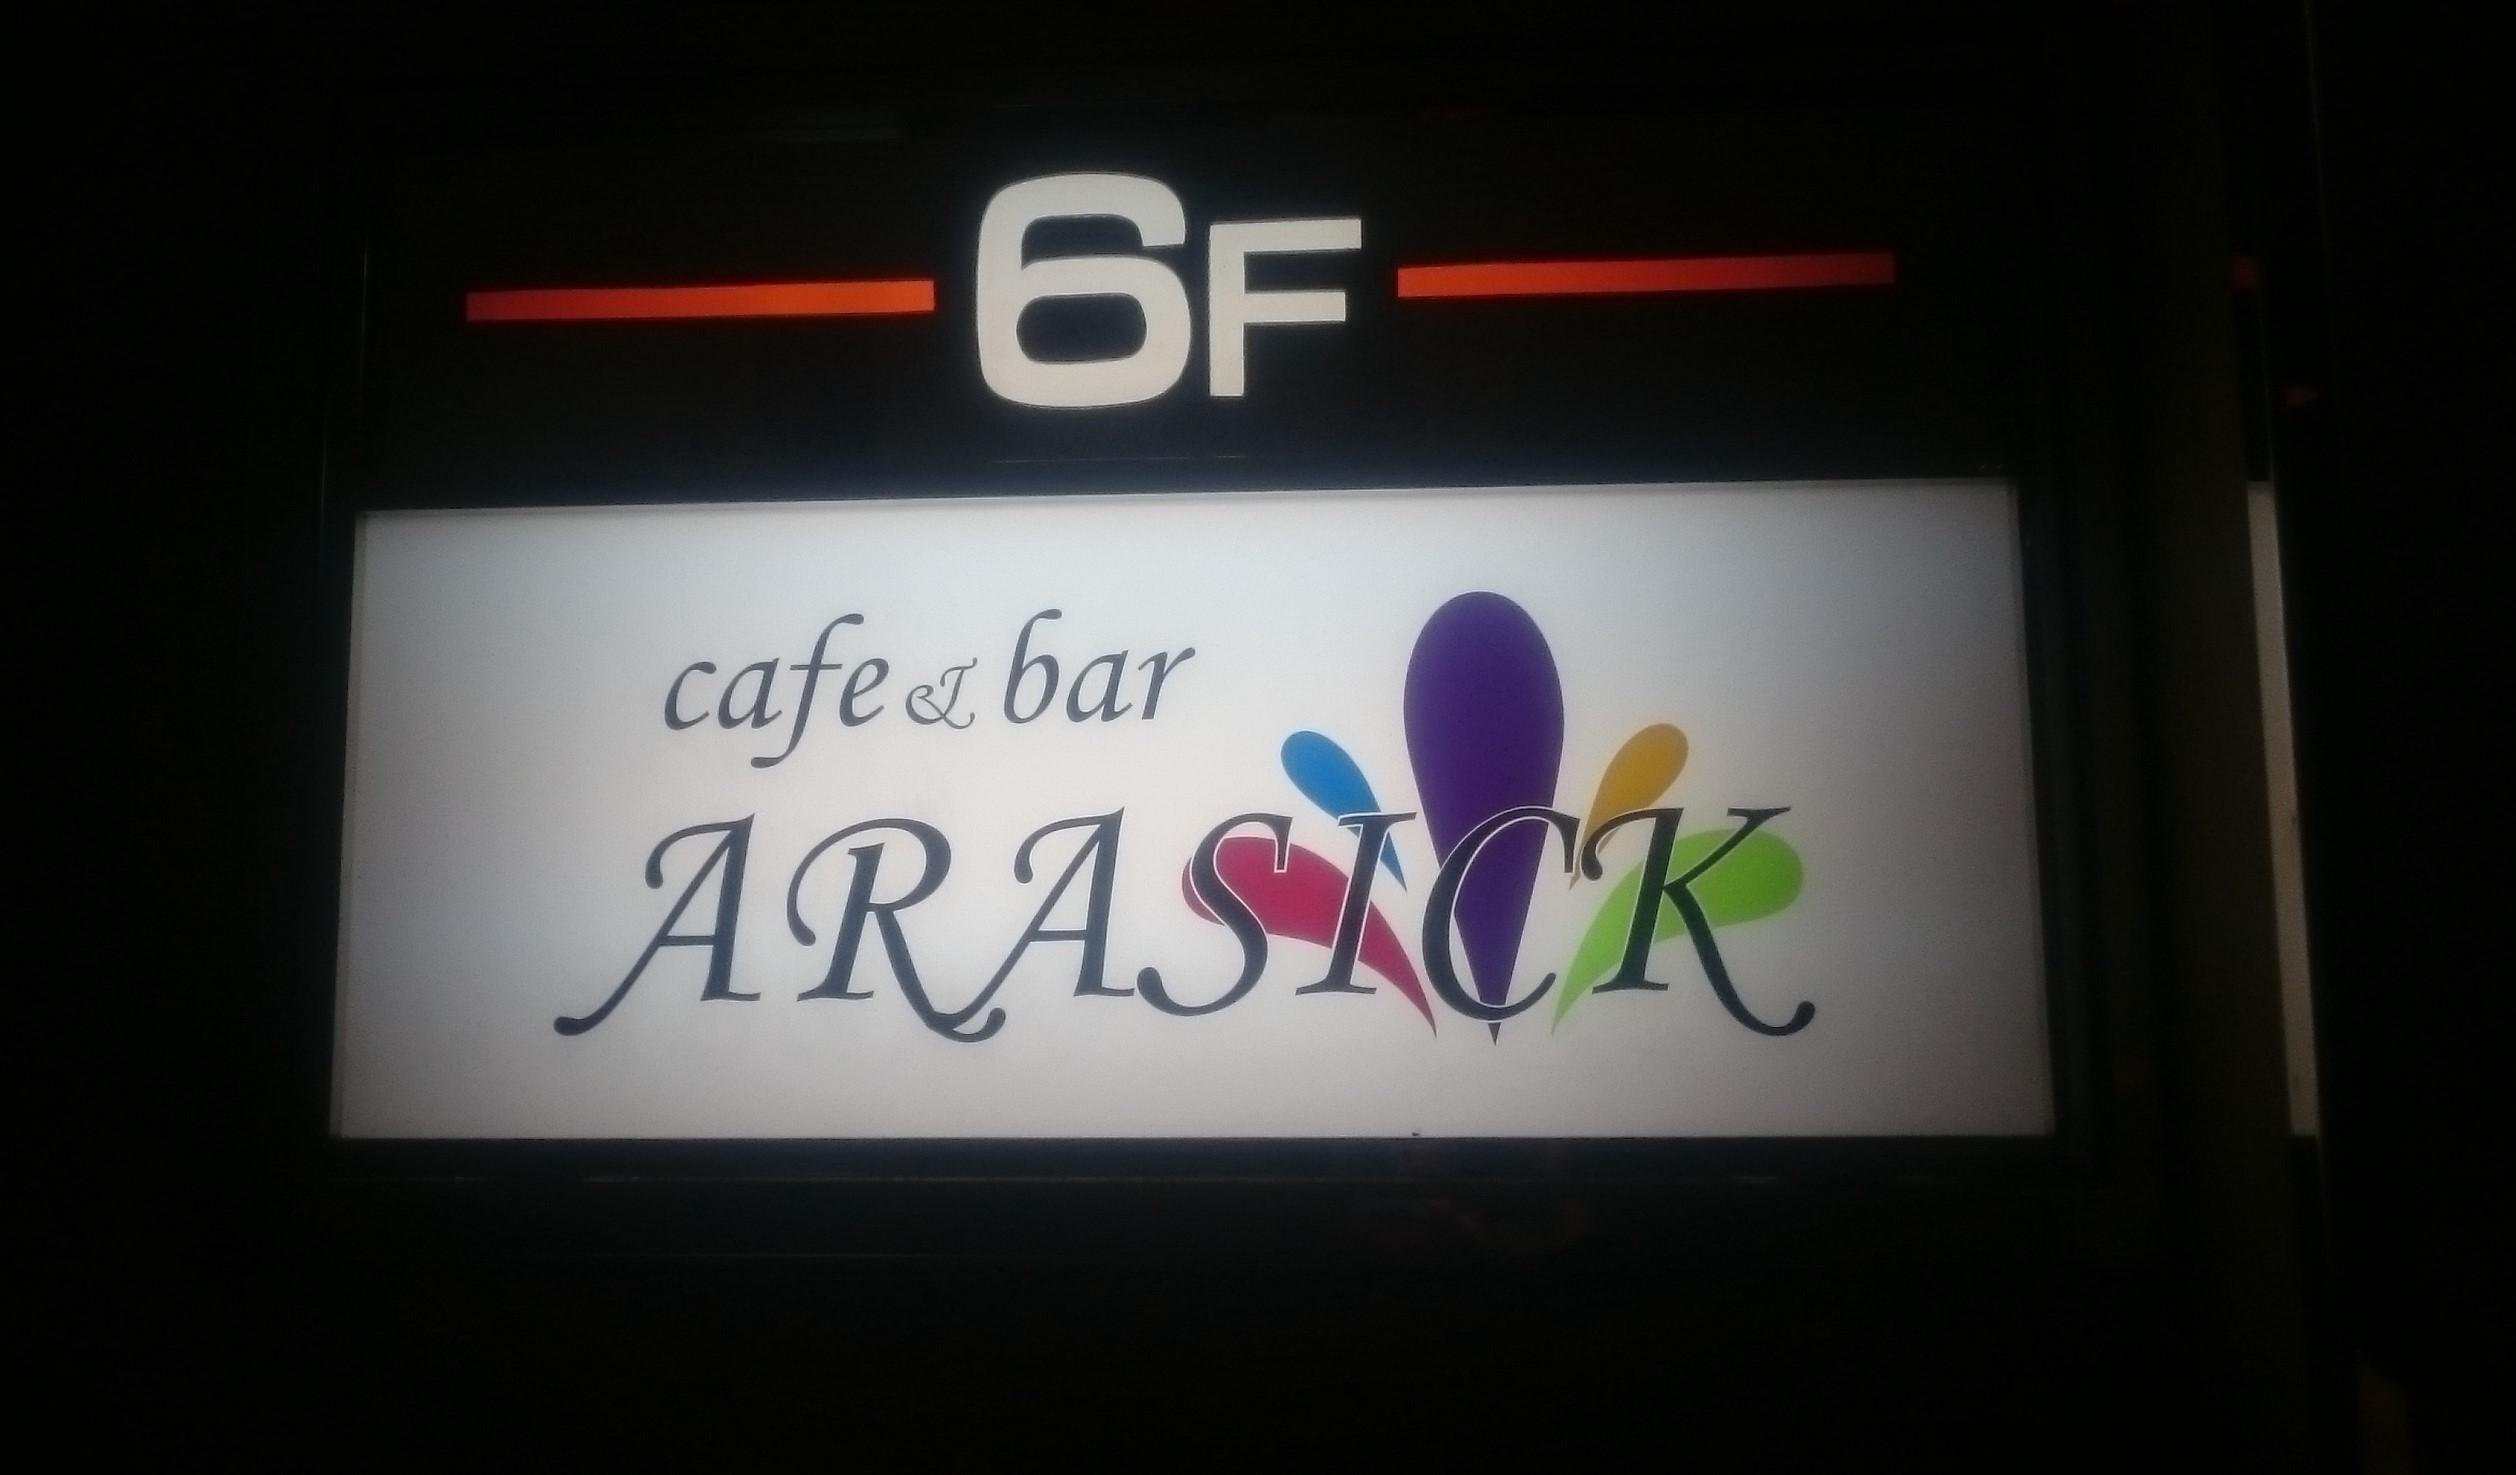 Cafe Bar Arasick